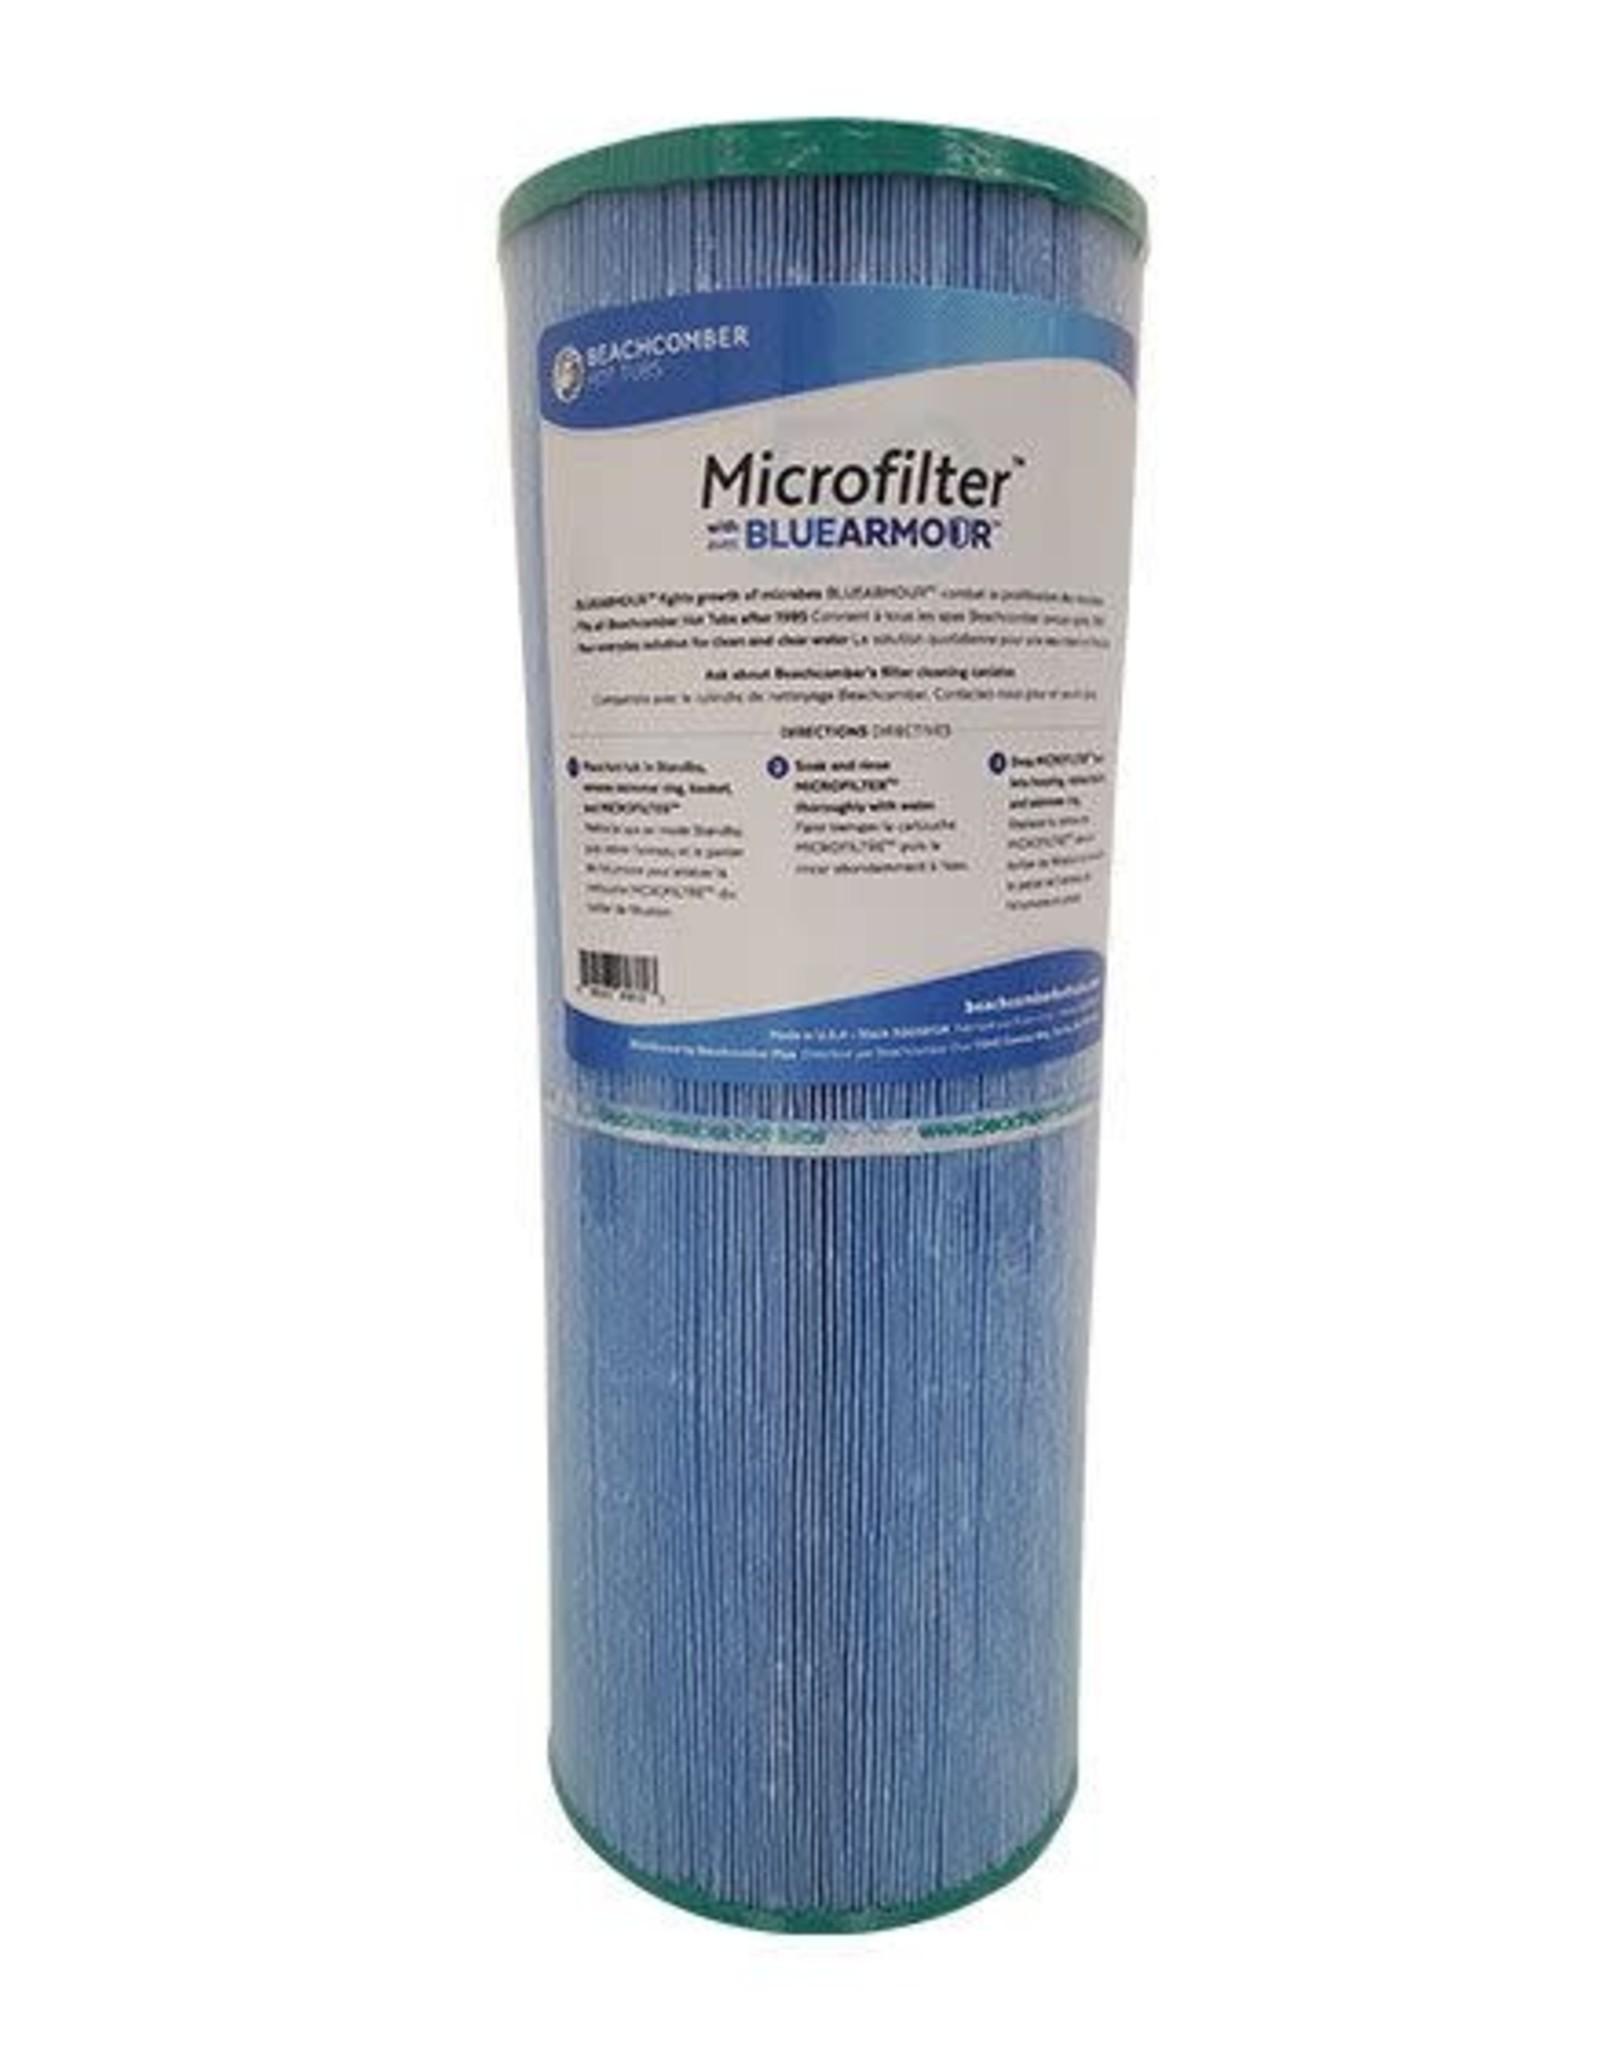 BEACHCOMBER BEACHCOMBER MICROFILTER BLUE ARMOUR 50 SQ